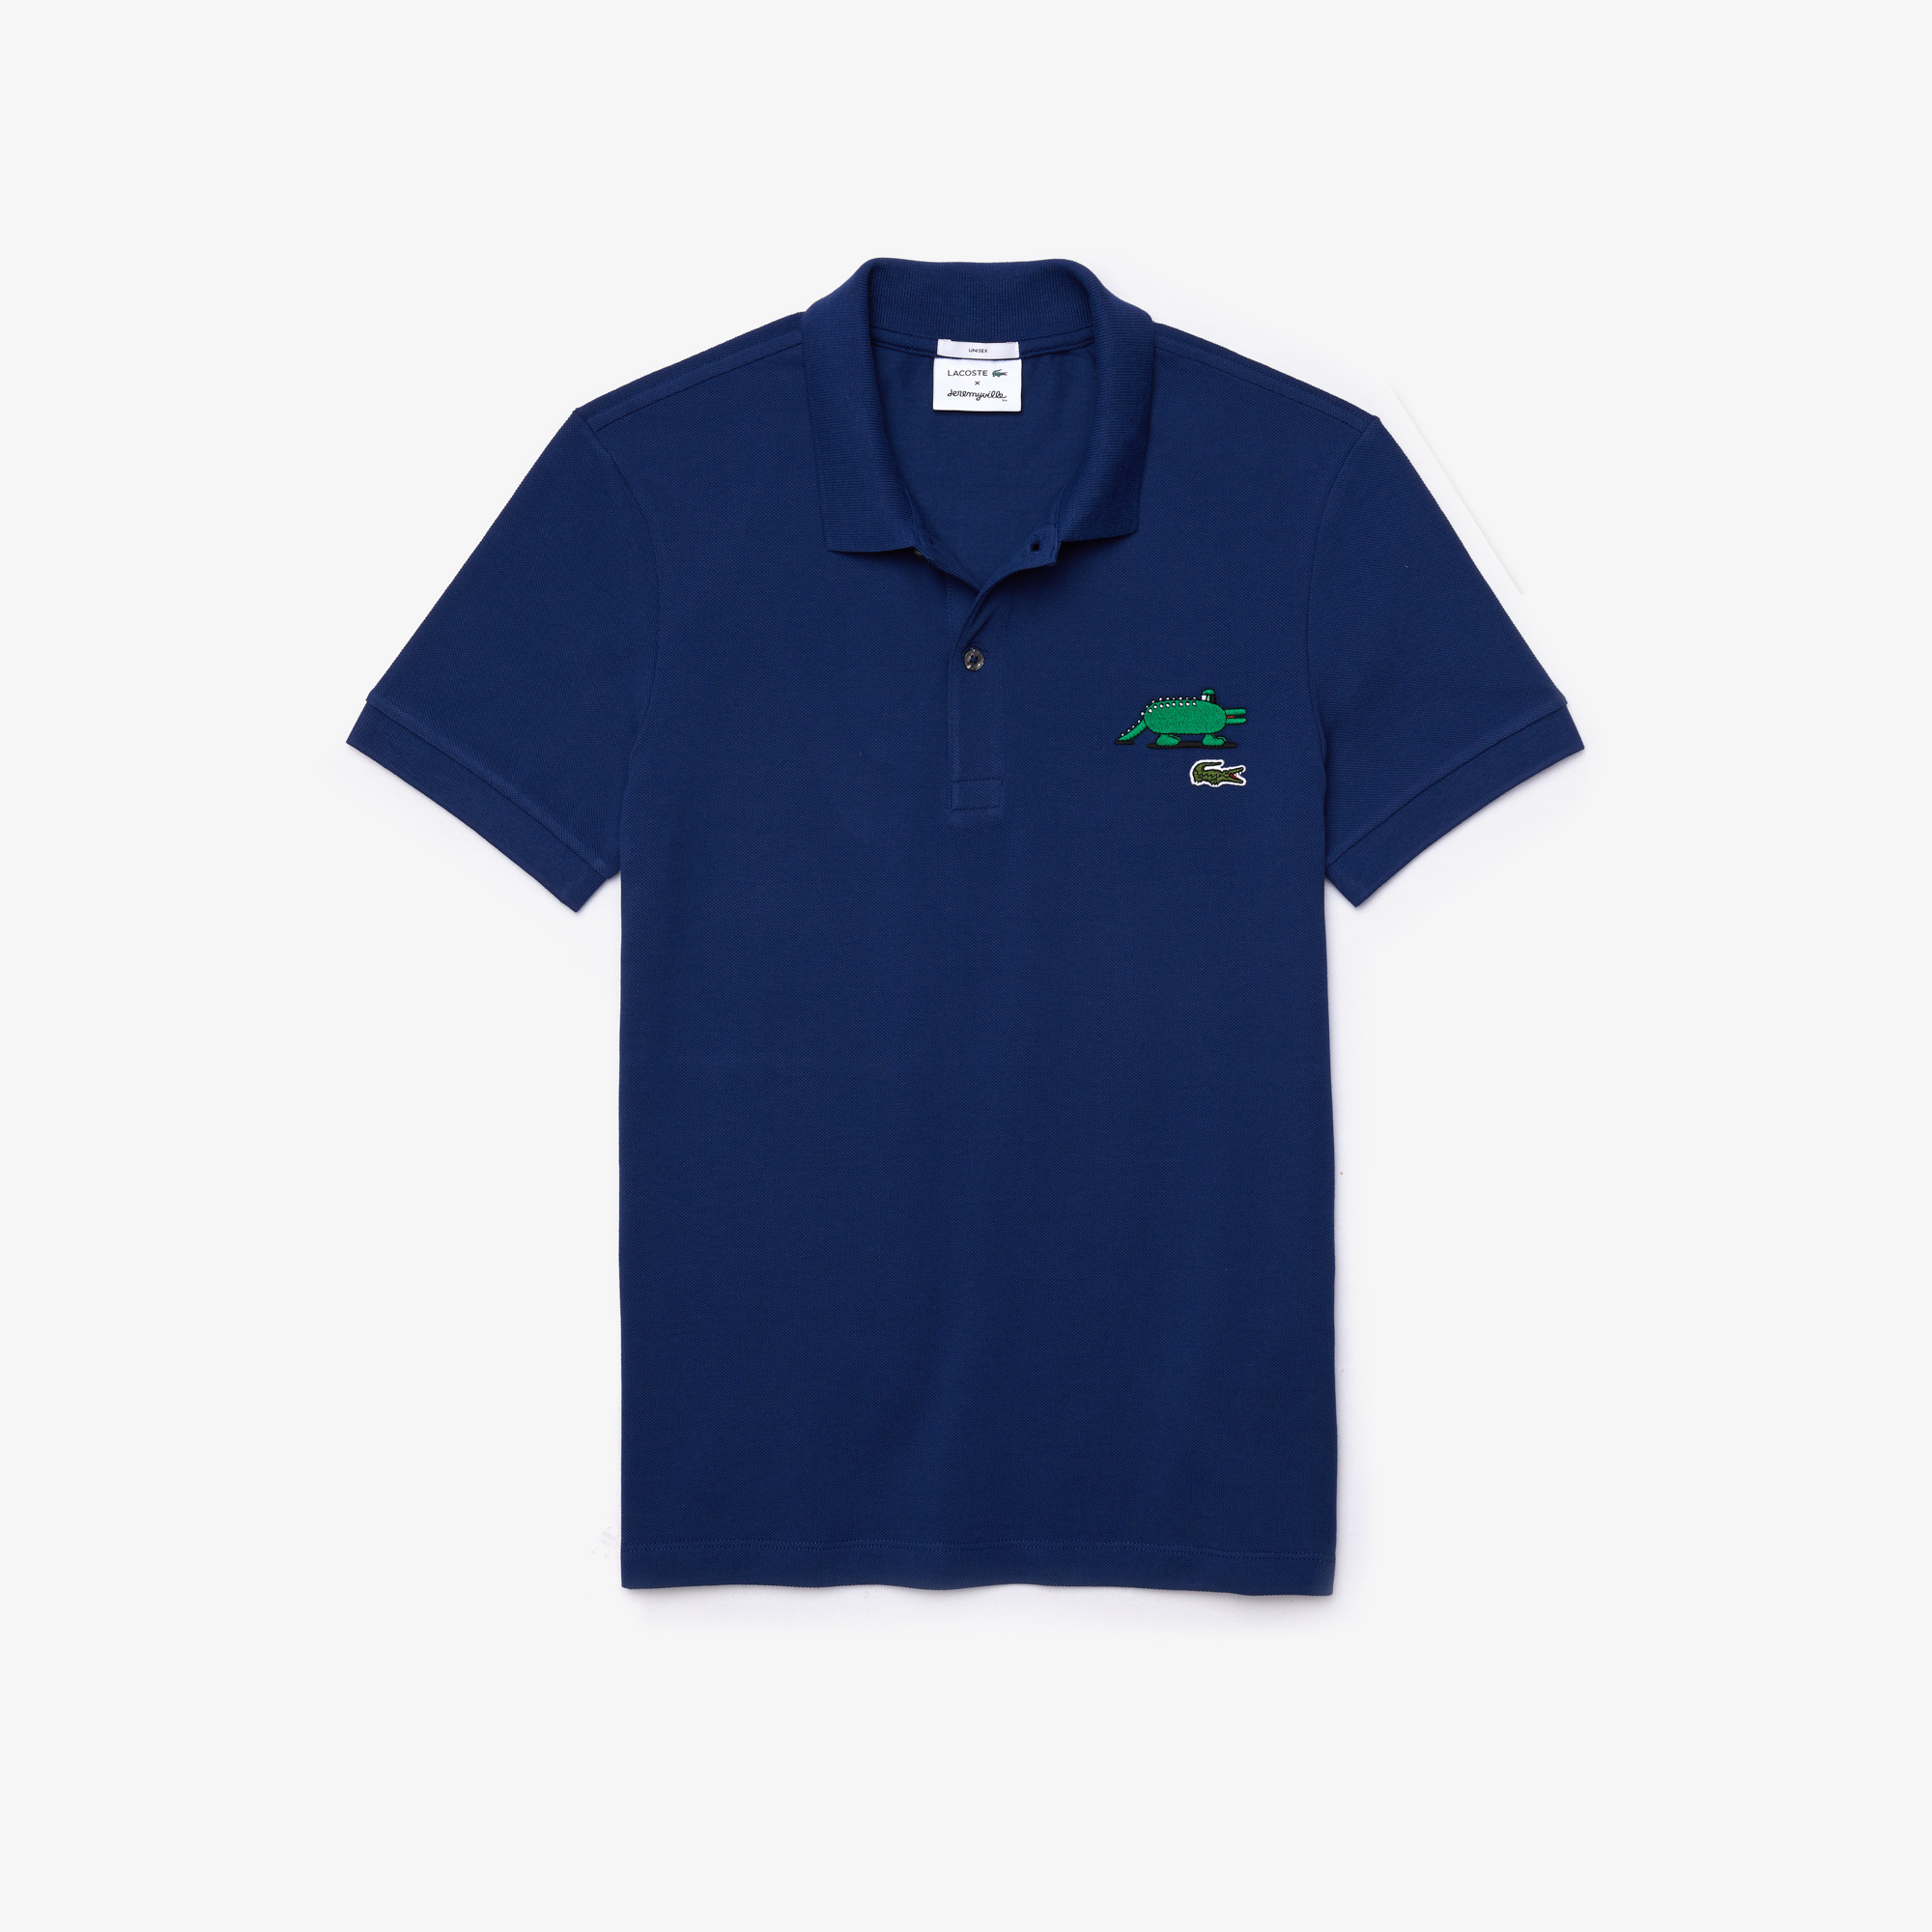 Lacoste Koszulka Polo x Jeremyville Unisex Z Nadrukiem